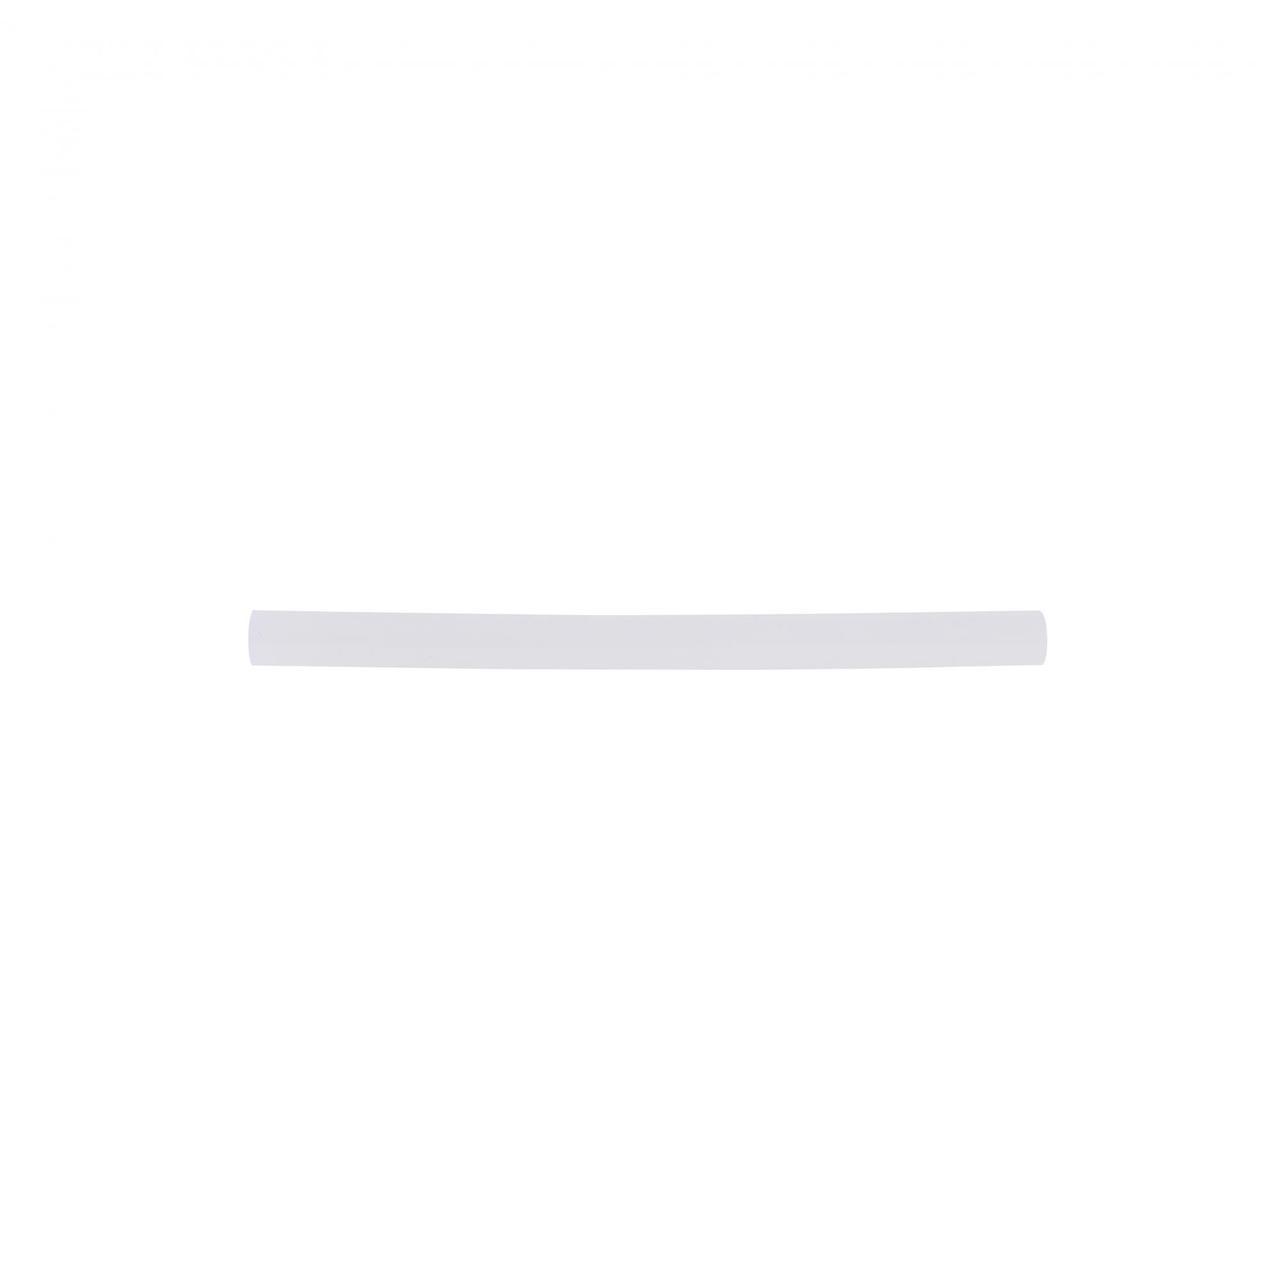 Стержни клеевые EDGE by PATRIOT 7*100мм белые, упаковка 10шт